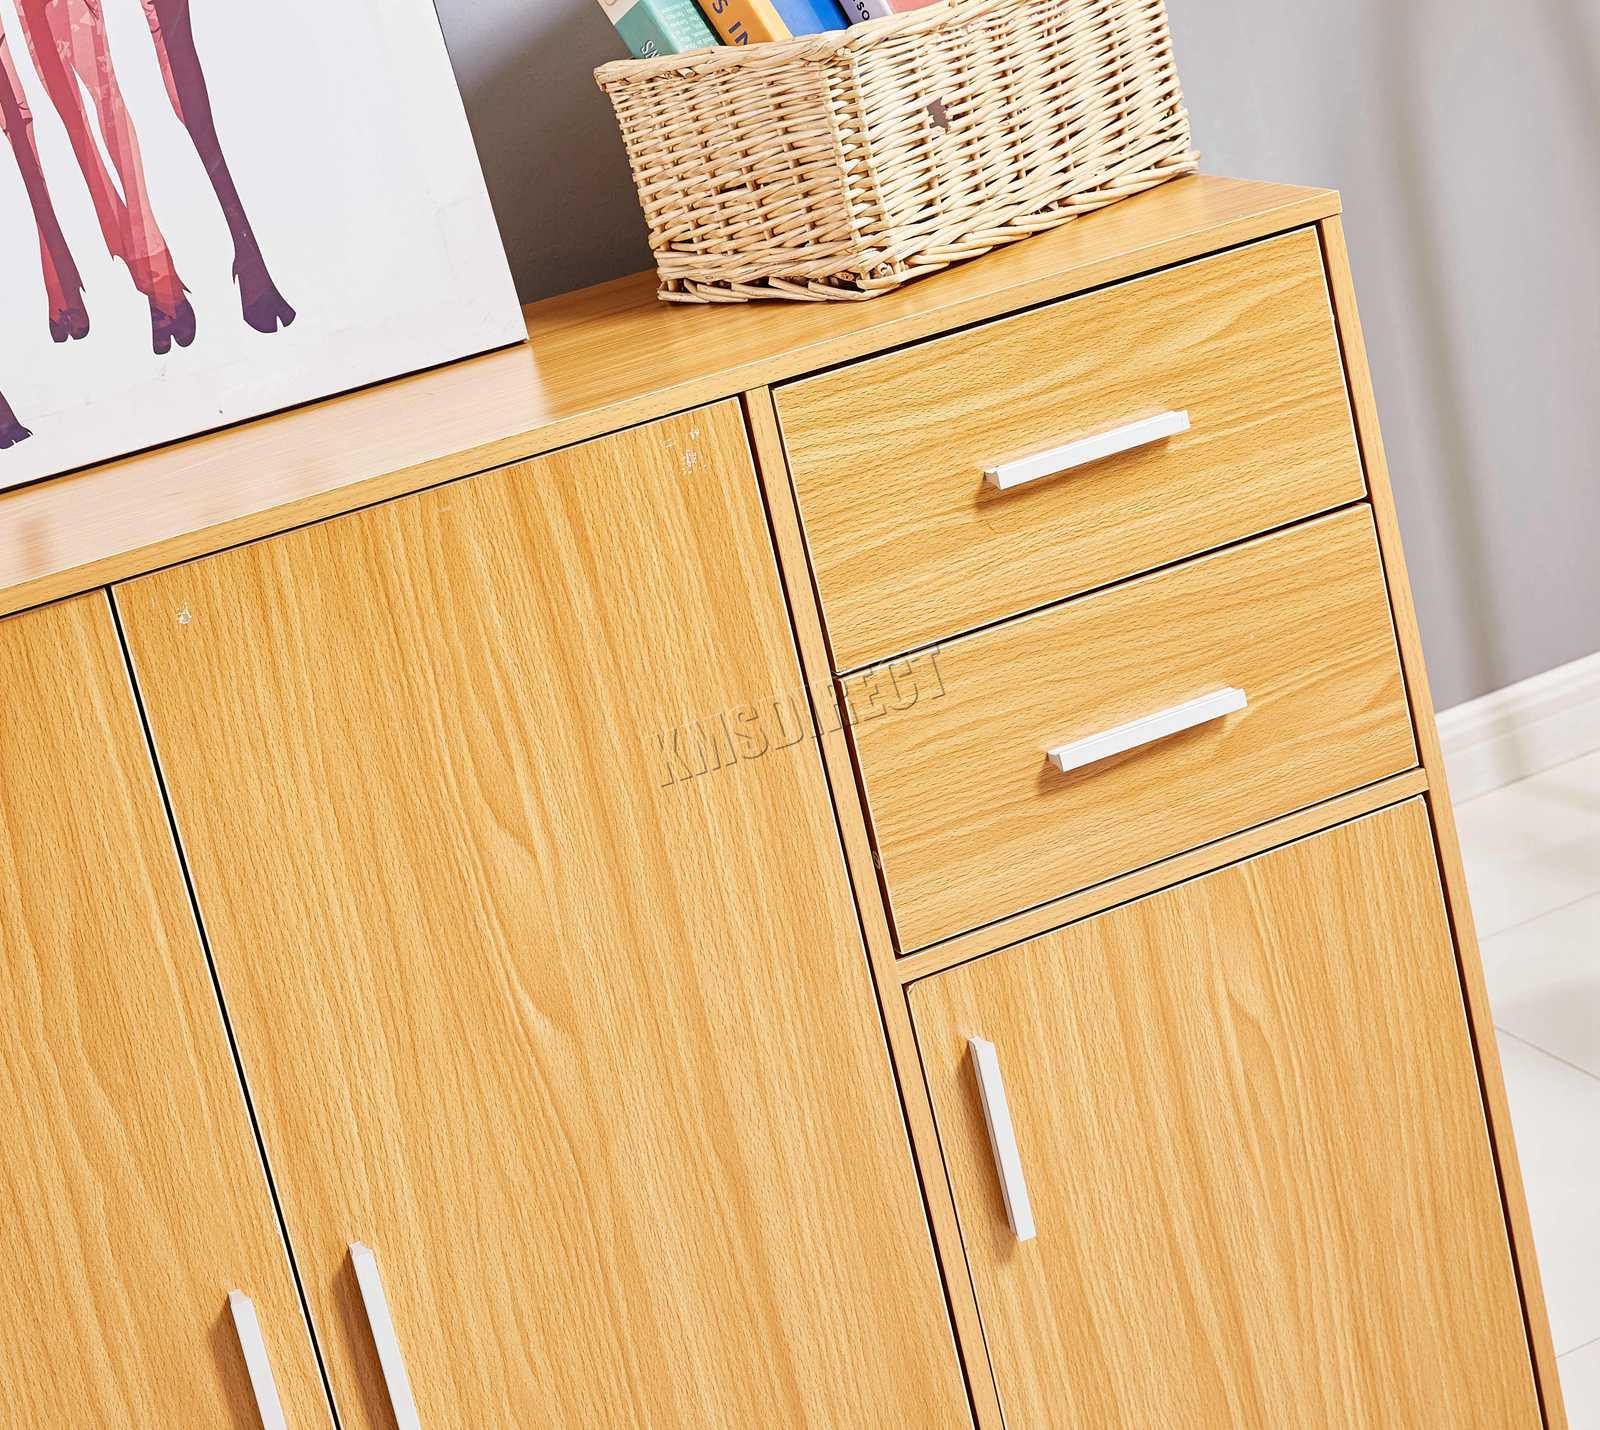 WestWood-Sideboard-Cabinet-Storage-tableware-Kitchen-Cupboard-Unit-PB-SSP01-NEW thumbnail 18